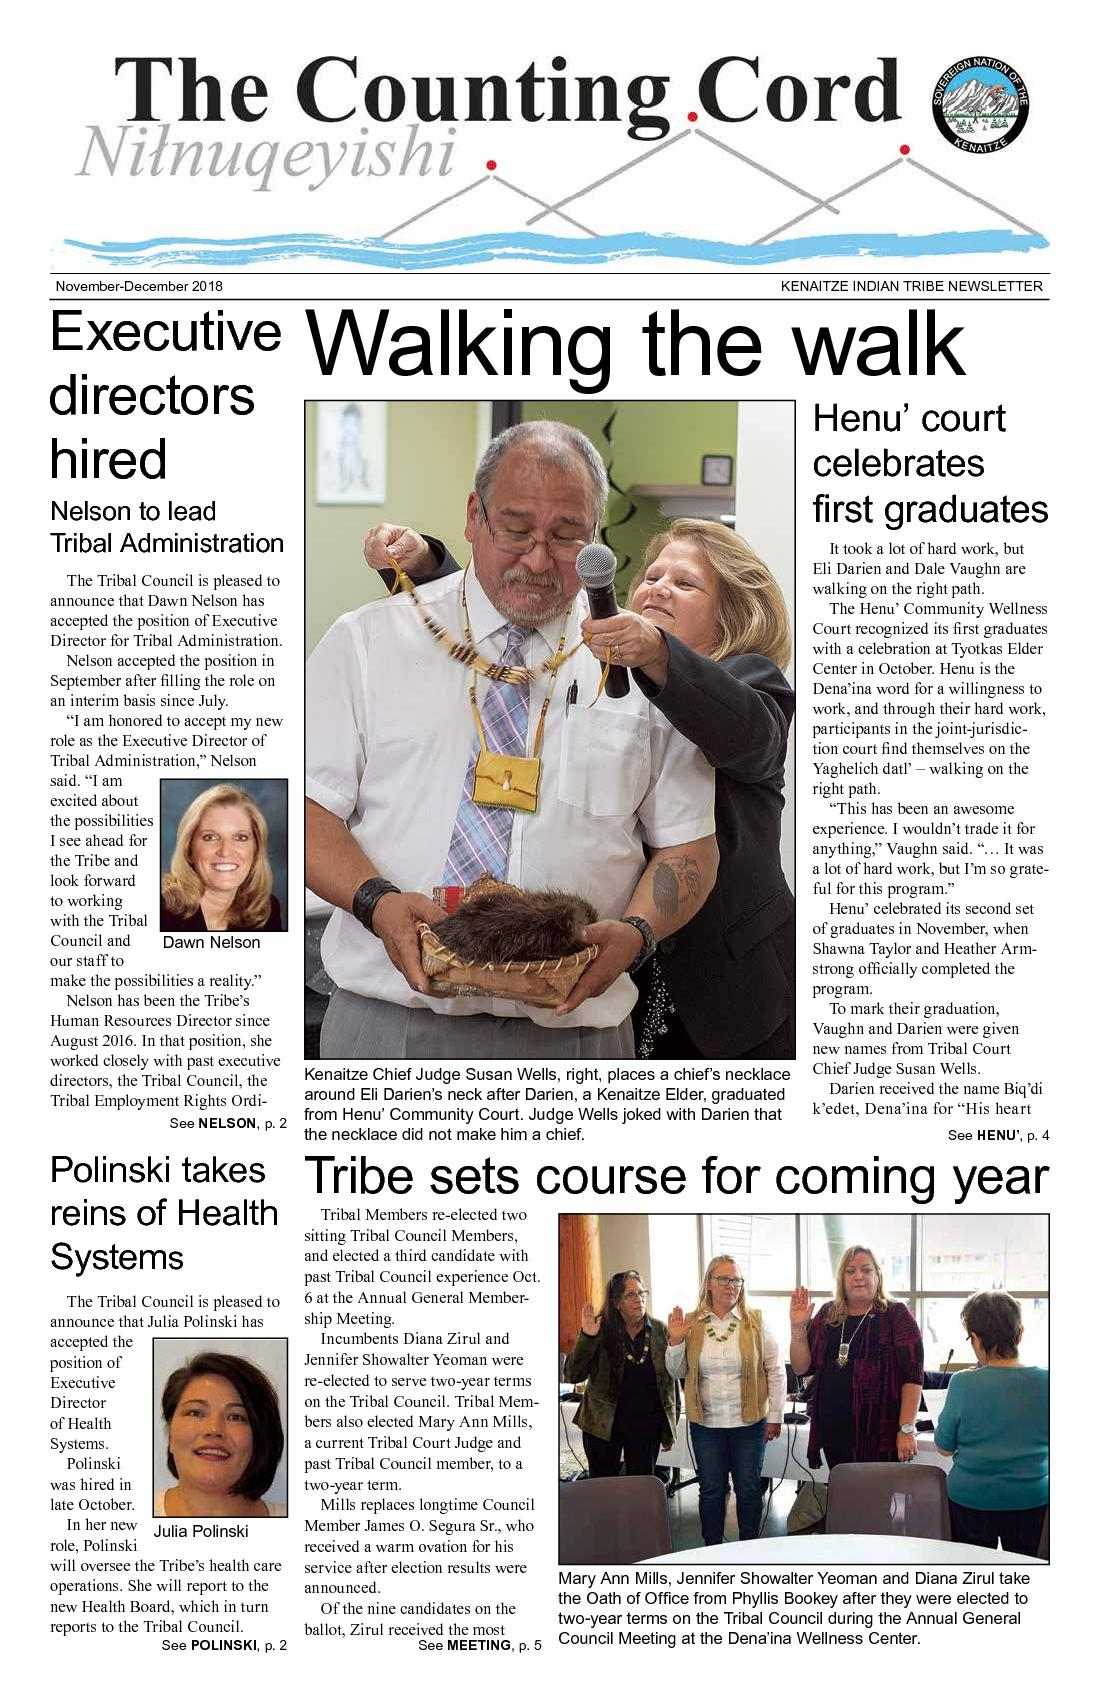 See MEETING, p. 5Walking the walkThe Tri